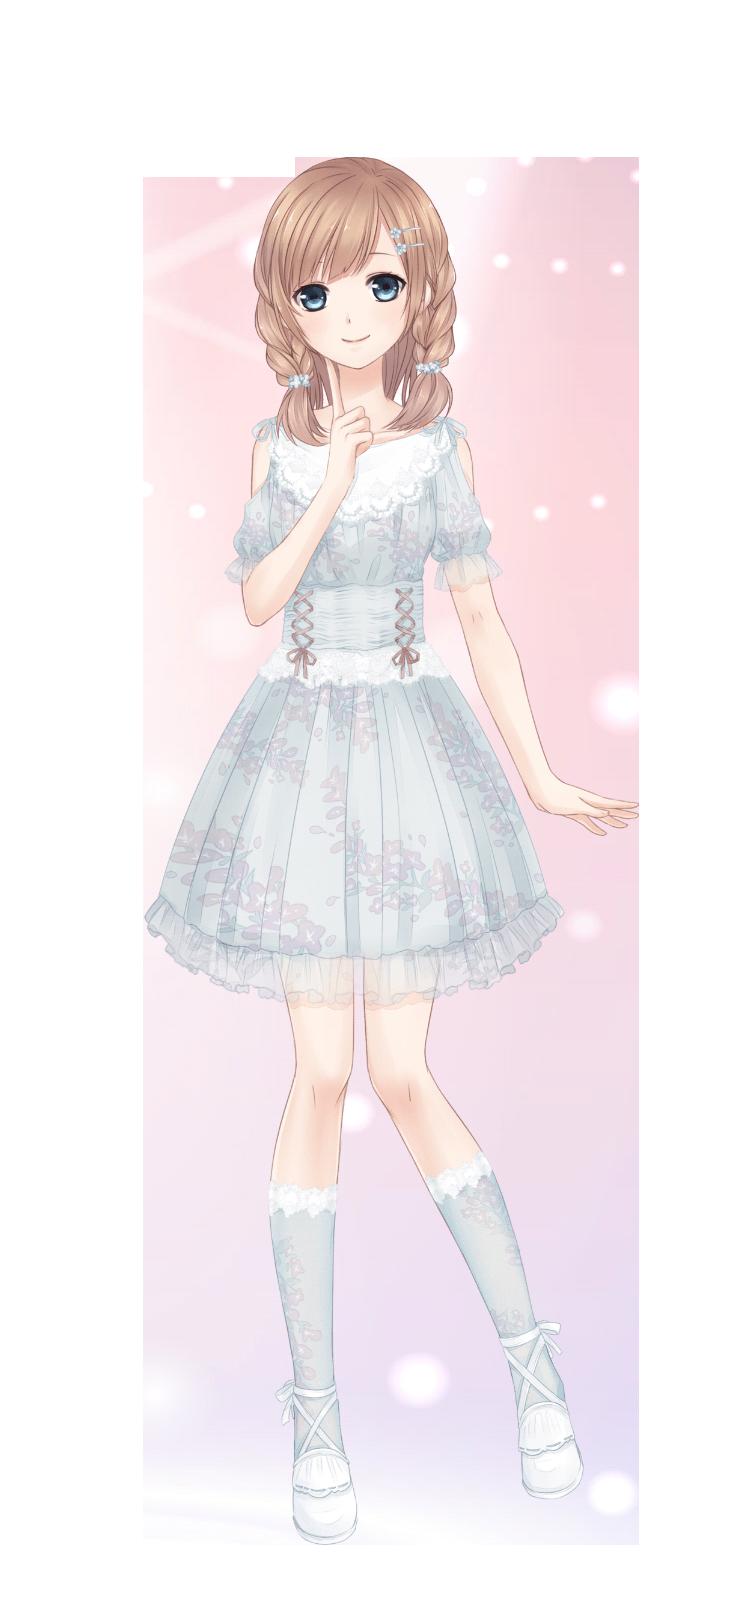 Niños anime anime dolls anime art manga girl dream anime chibi